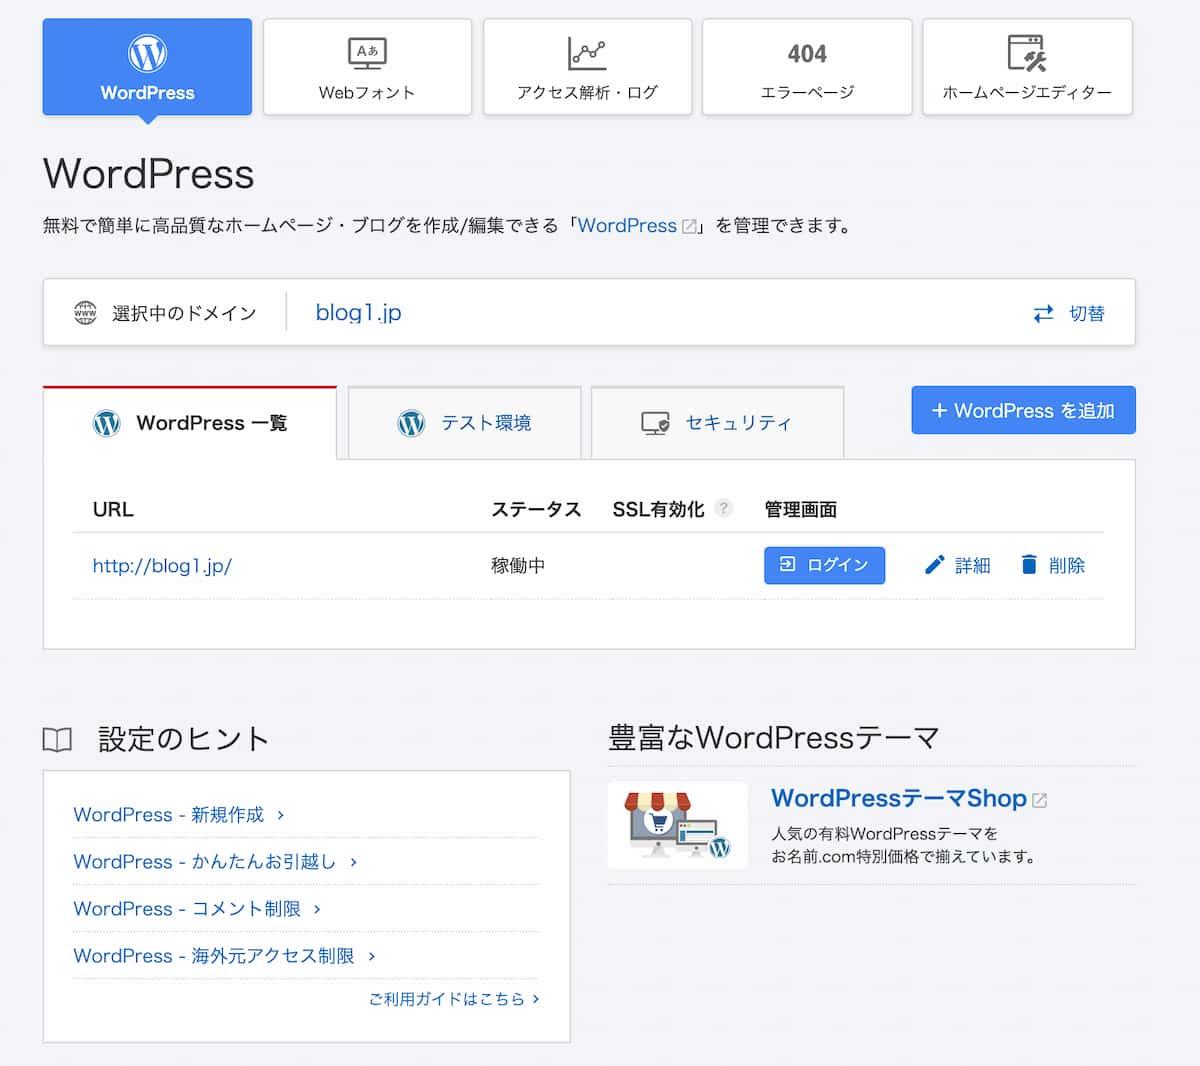 WordPressのセットアップが完了してお名前.comの管理画面に遷移する